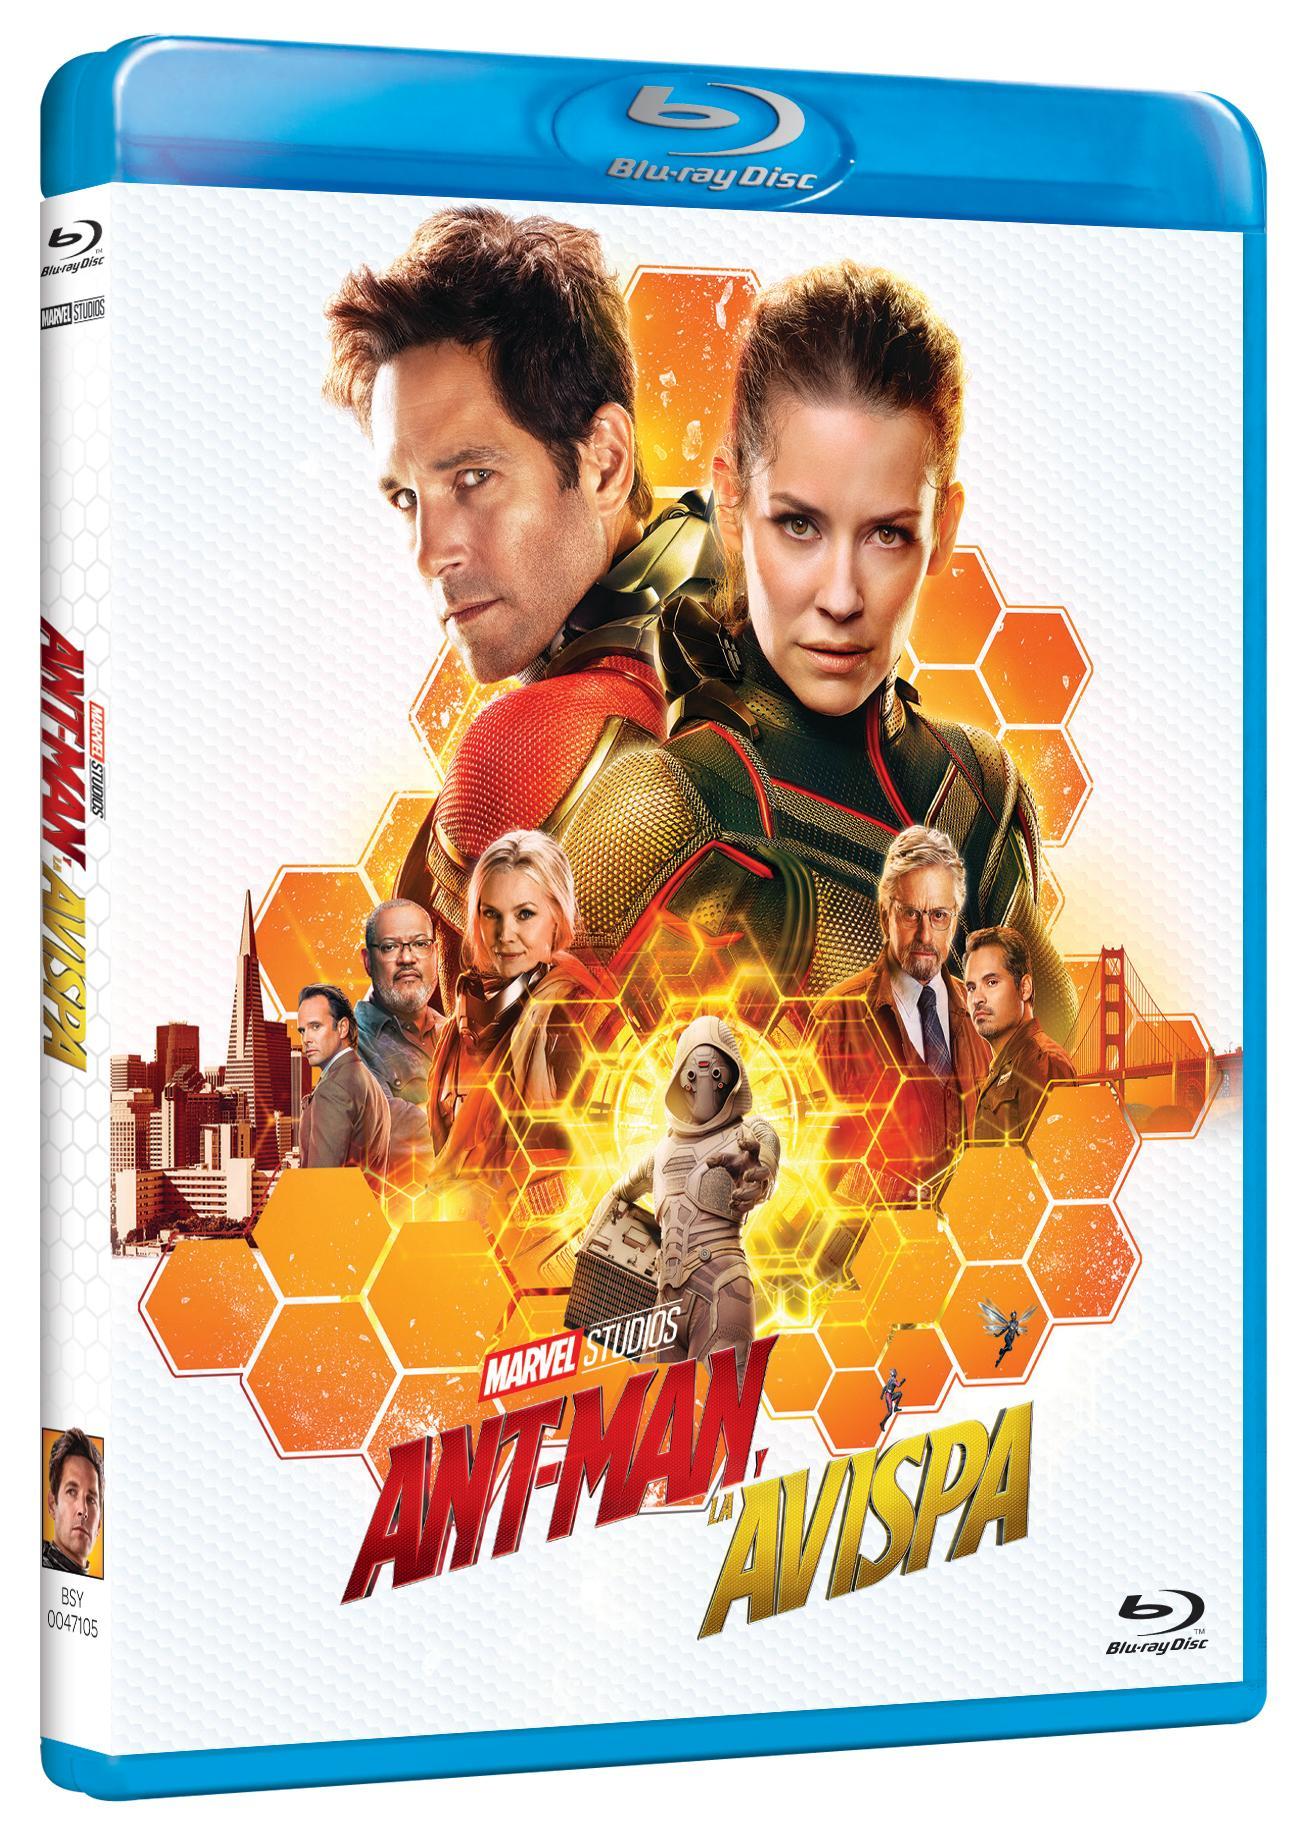 Ant-Man y la Avispa Blu-ray